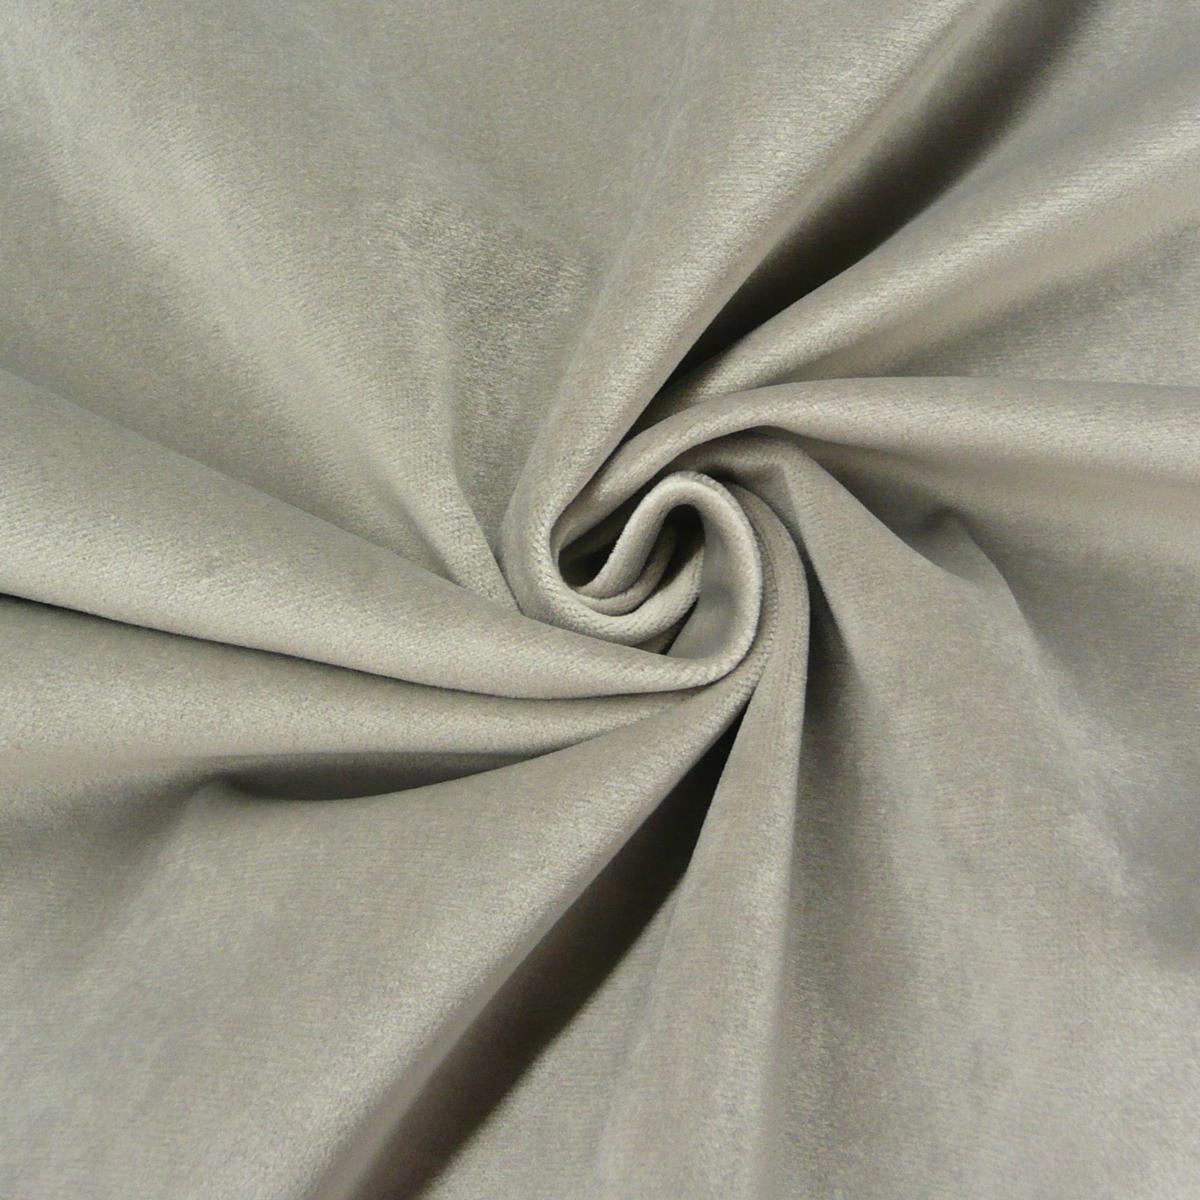 bezugsstoff polsterstoff samt samtstoff silberfarbig stoffe wohnstoffe m belstoffe. Black Bedroom Furniture Sets. Home Design Ideas